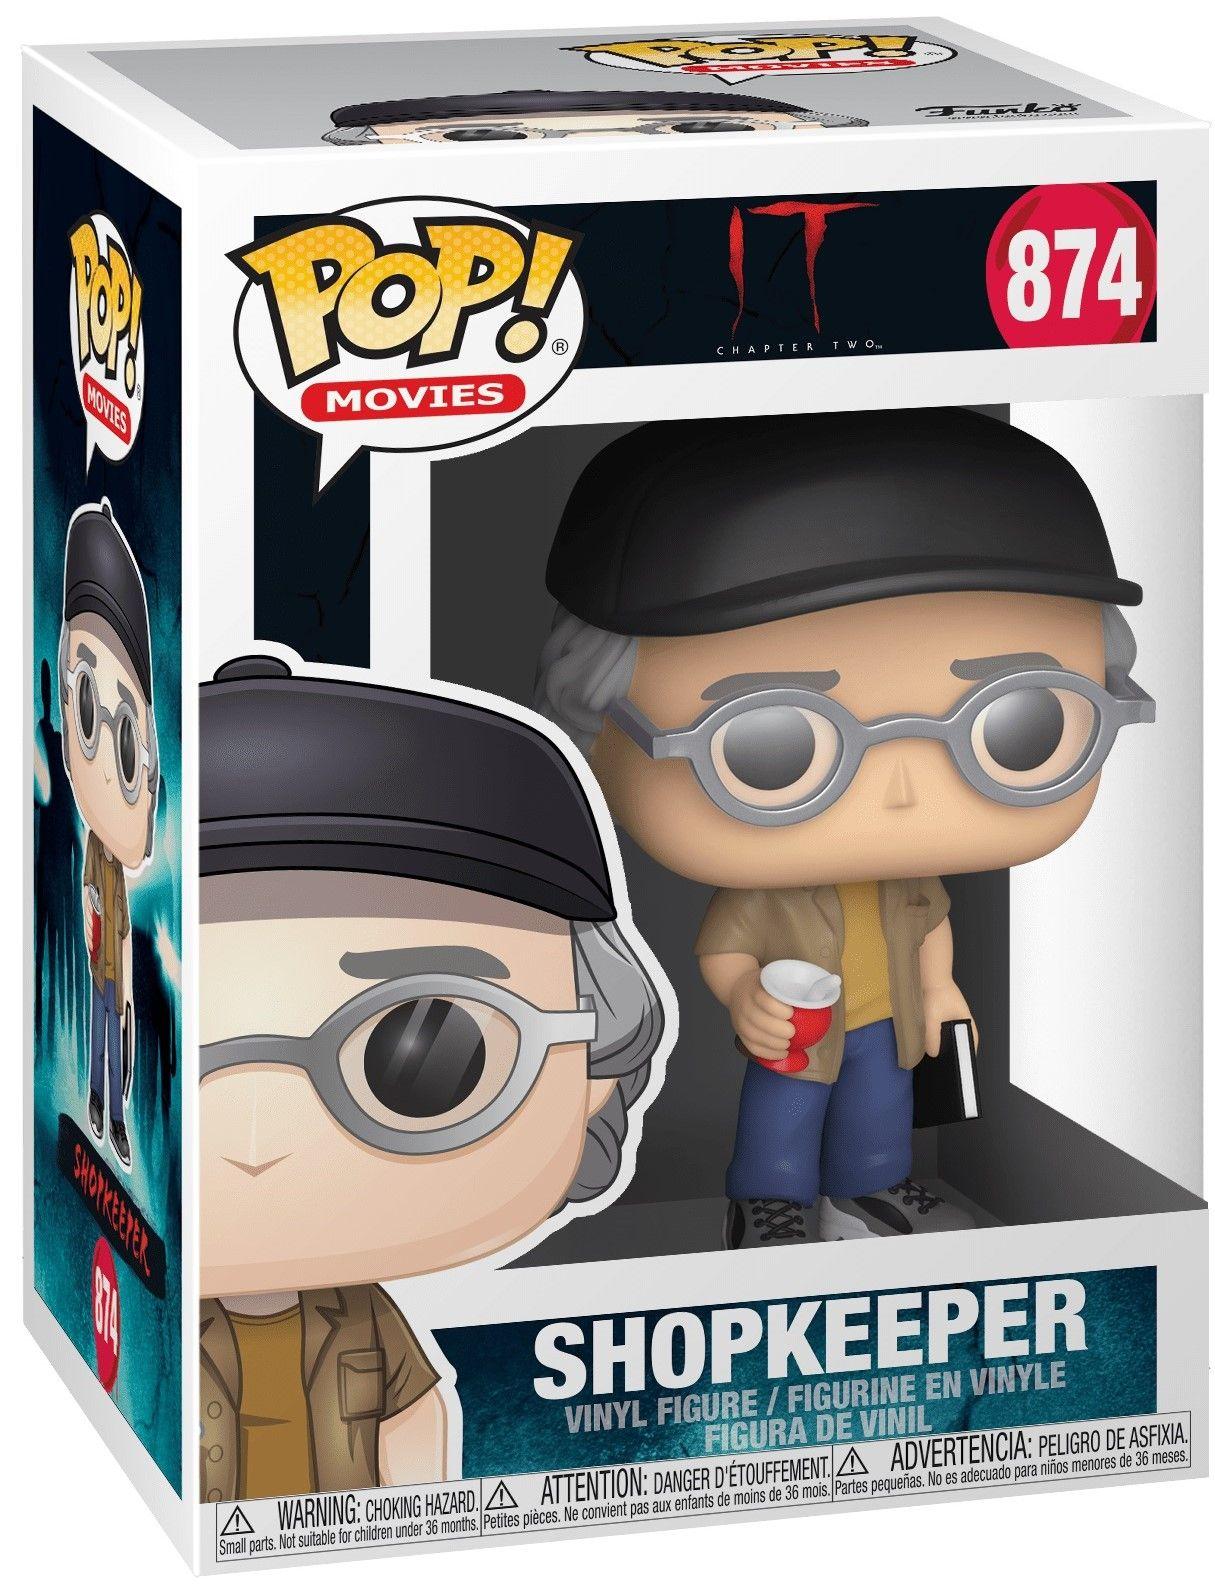 Фигура Funko Pop! Movies: IT 2 - Shopkeeper, #874 - 2